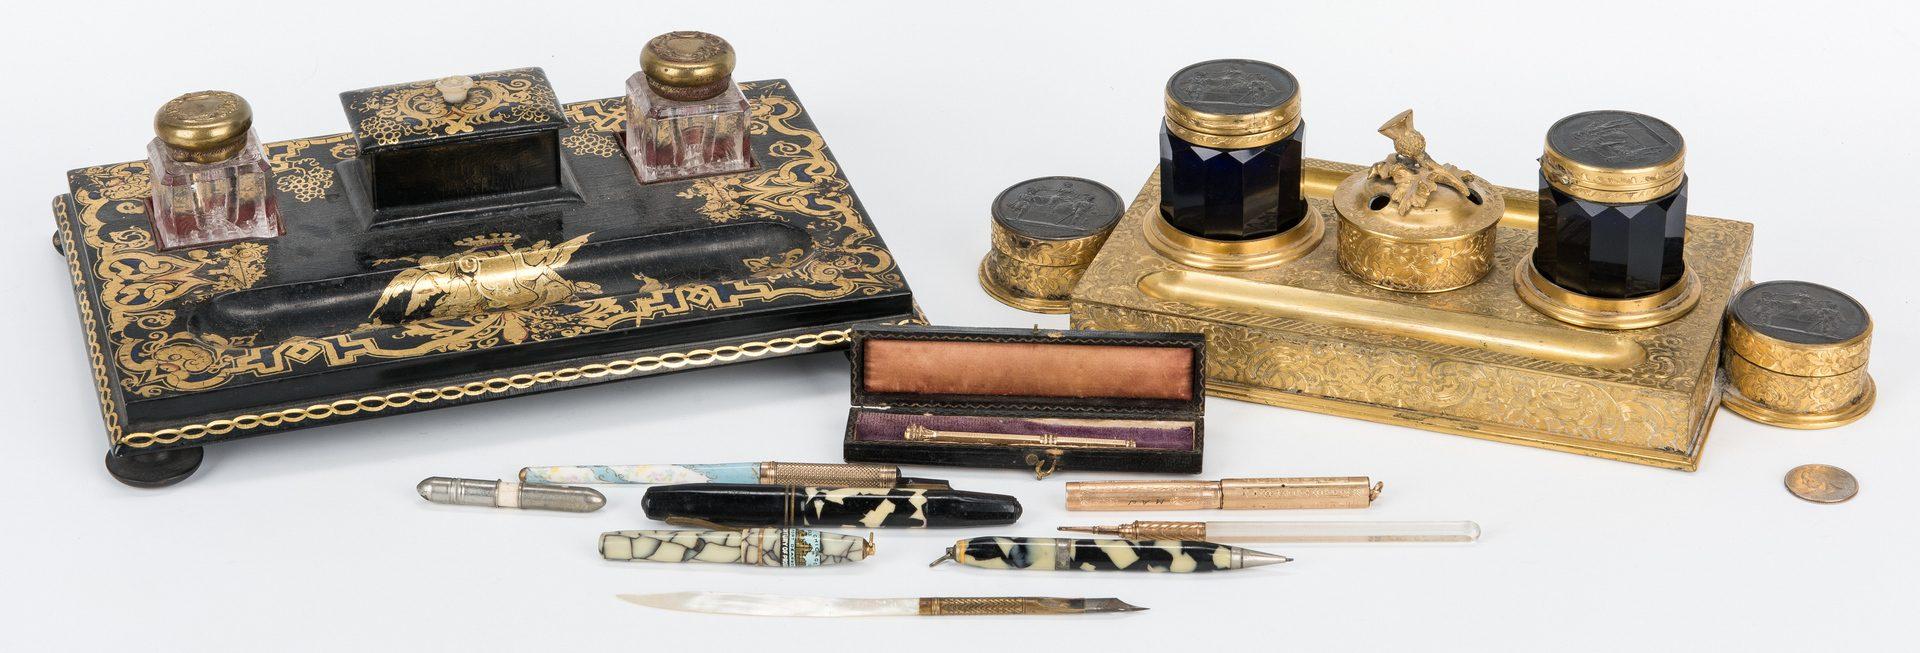 Lot 628: 2 Inkstands, Bronze & Papier Mache w/ Pens